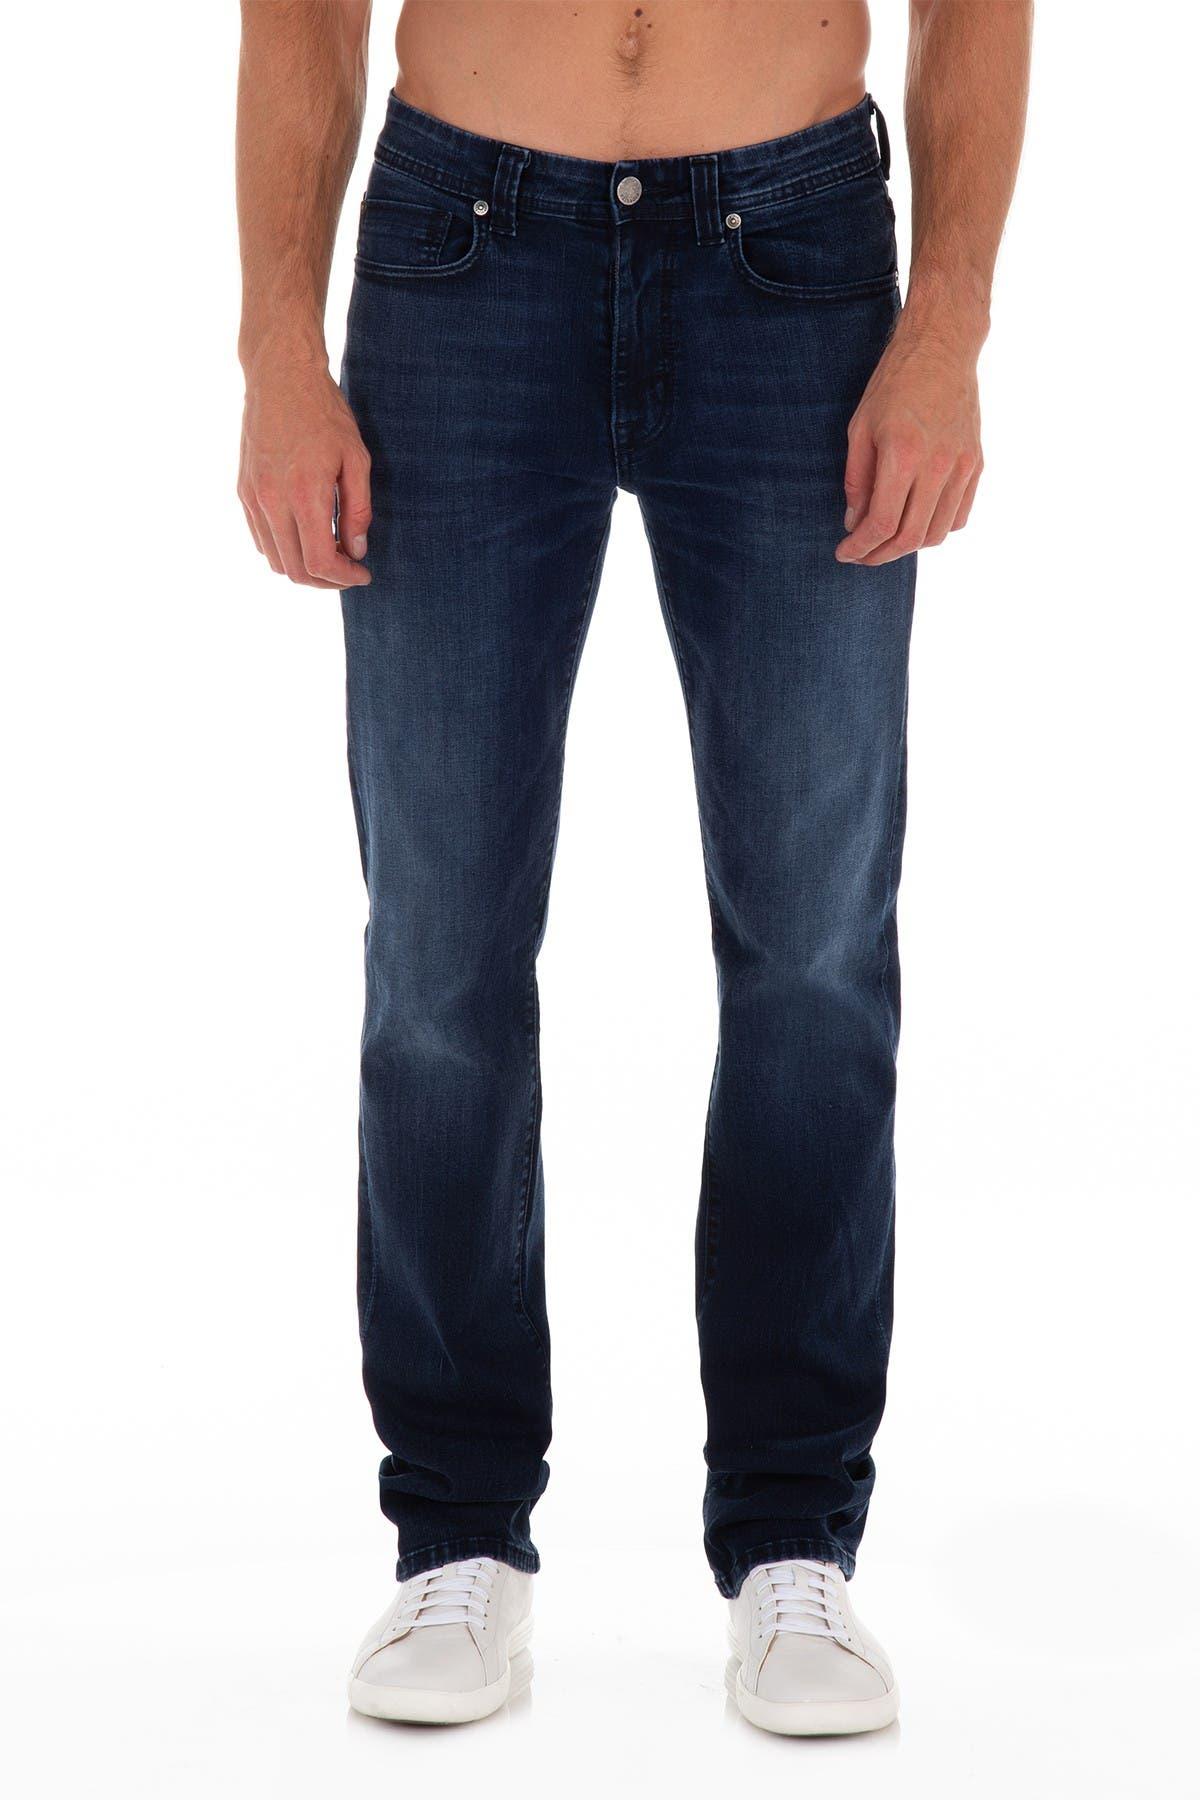 Image of FIDELITY DENIM Jimmy Slim Straight Leg Jeans